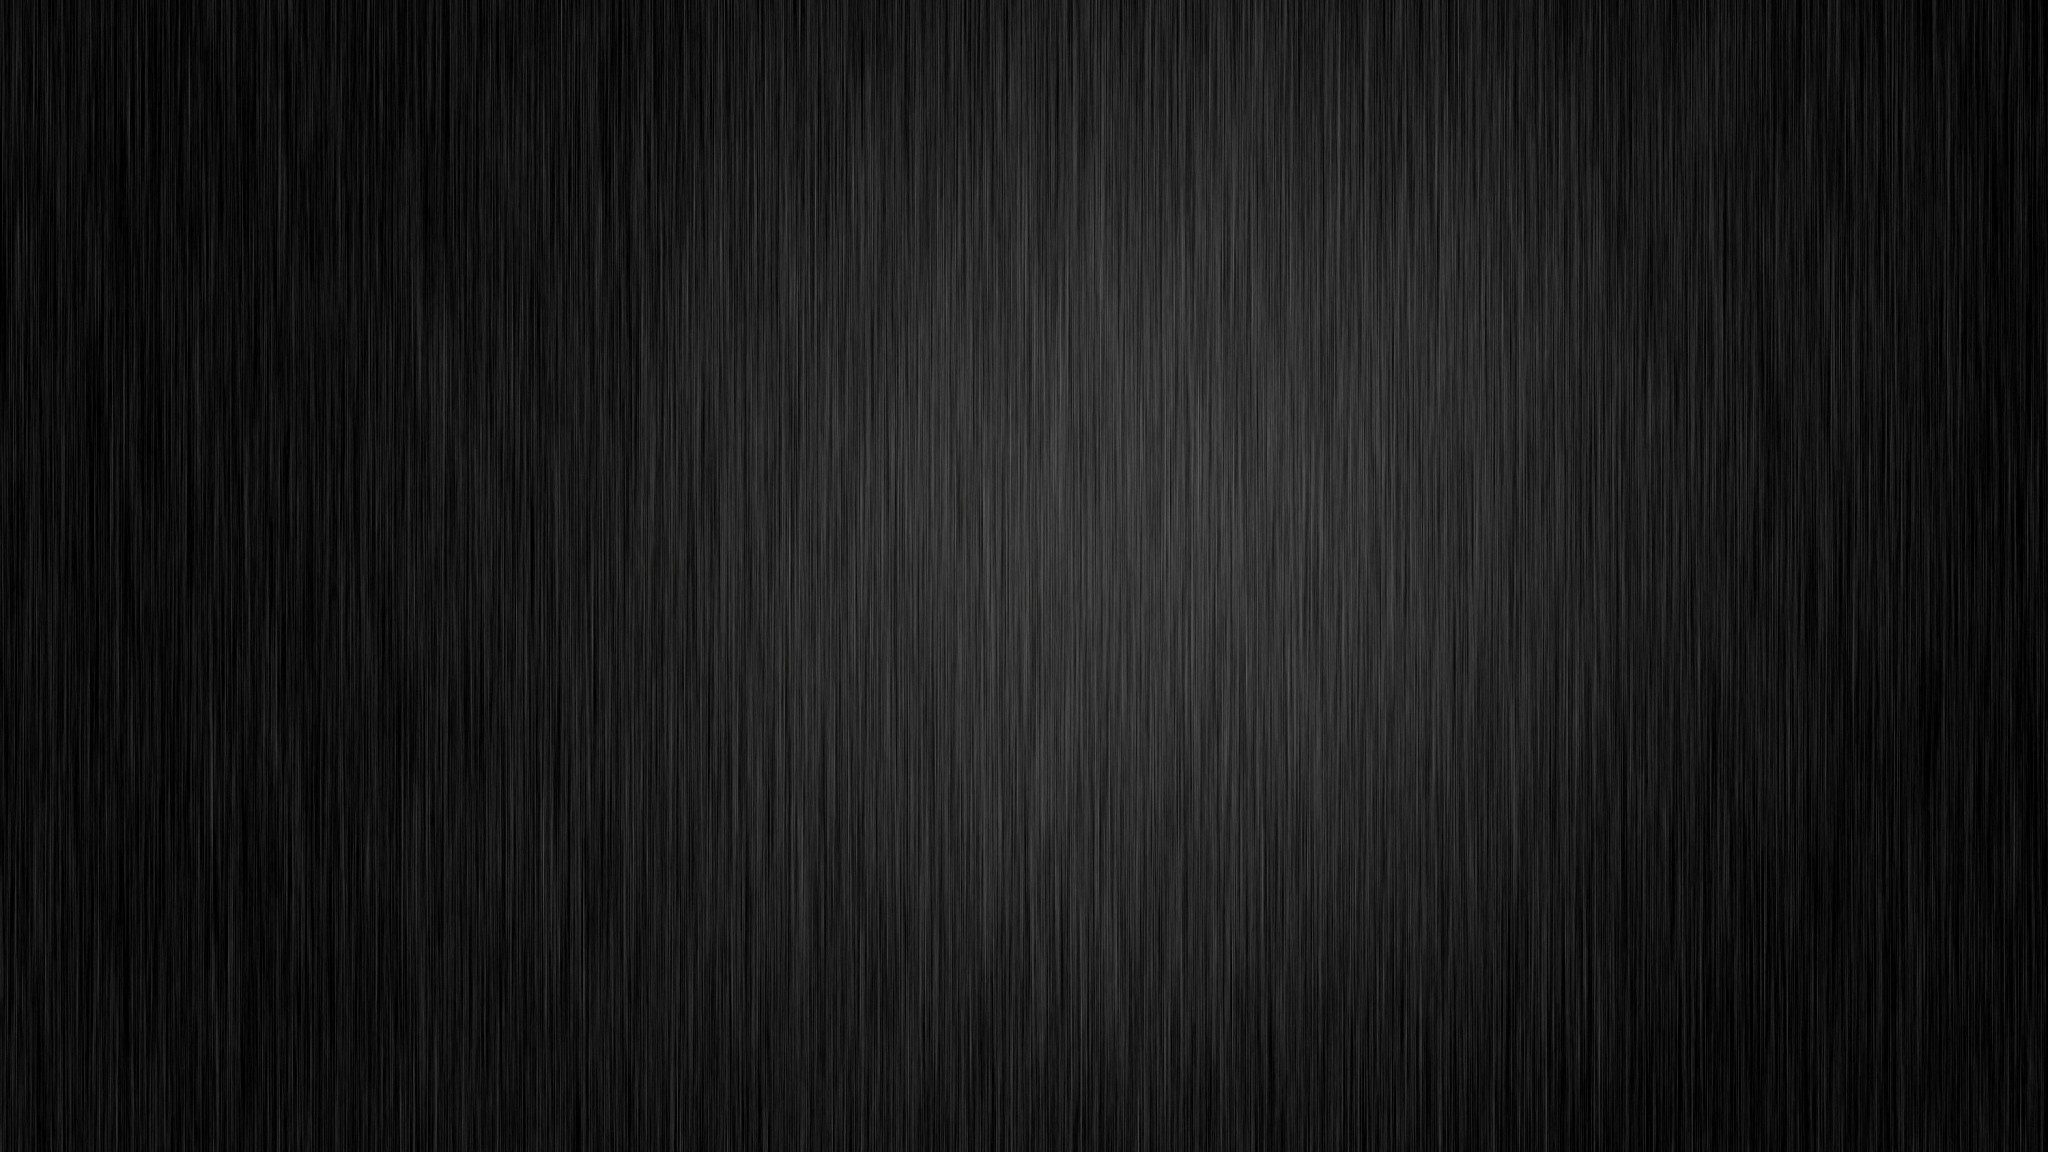 Black and Grey Desktop Wallpaper (63+ images)